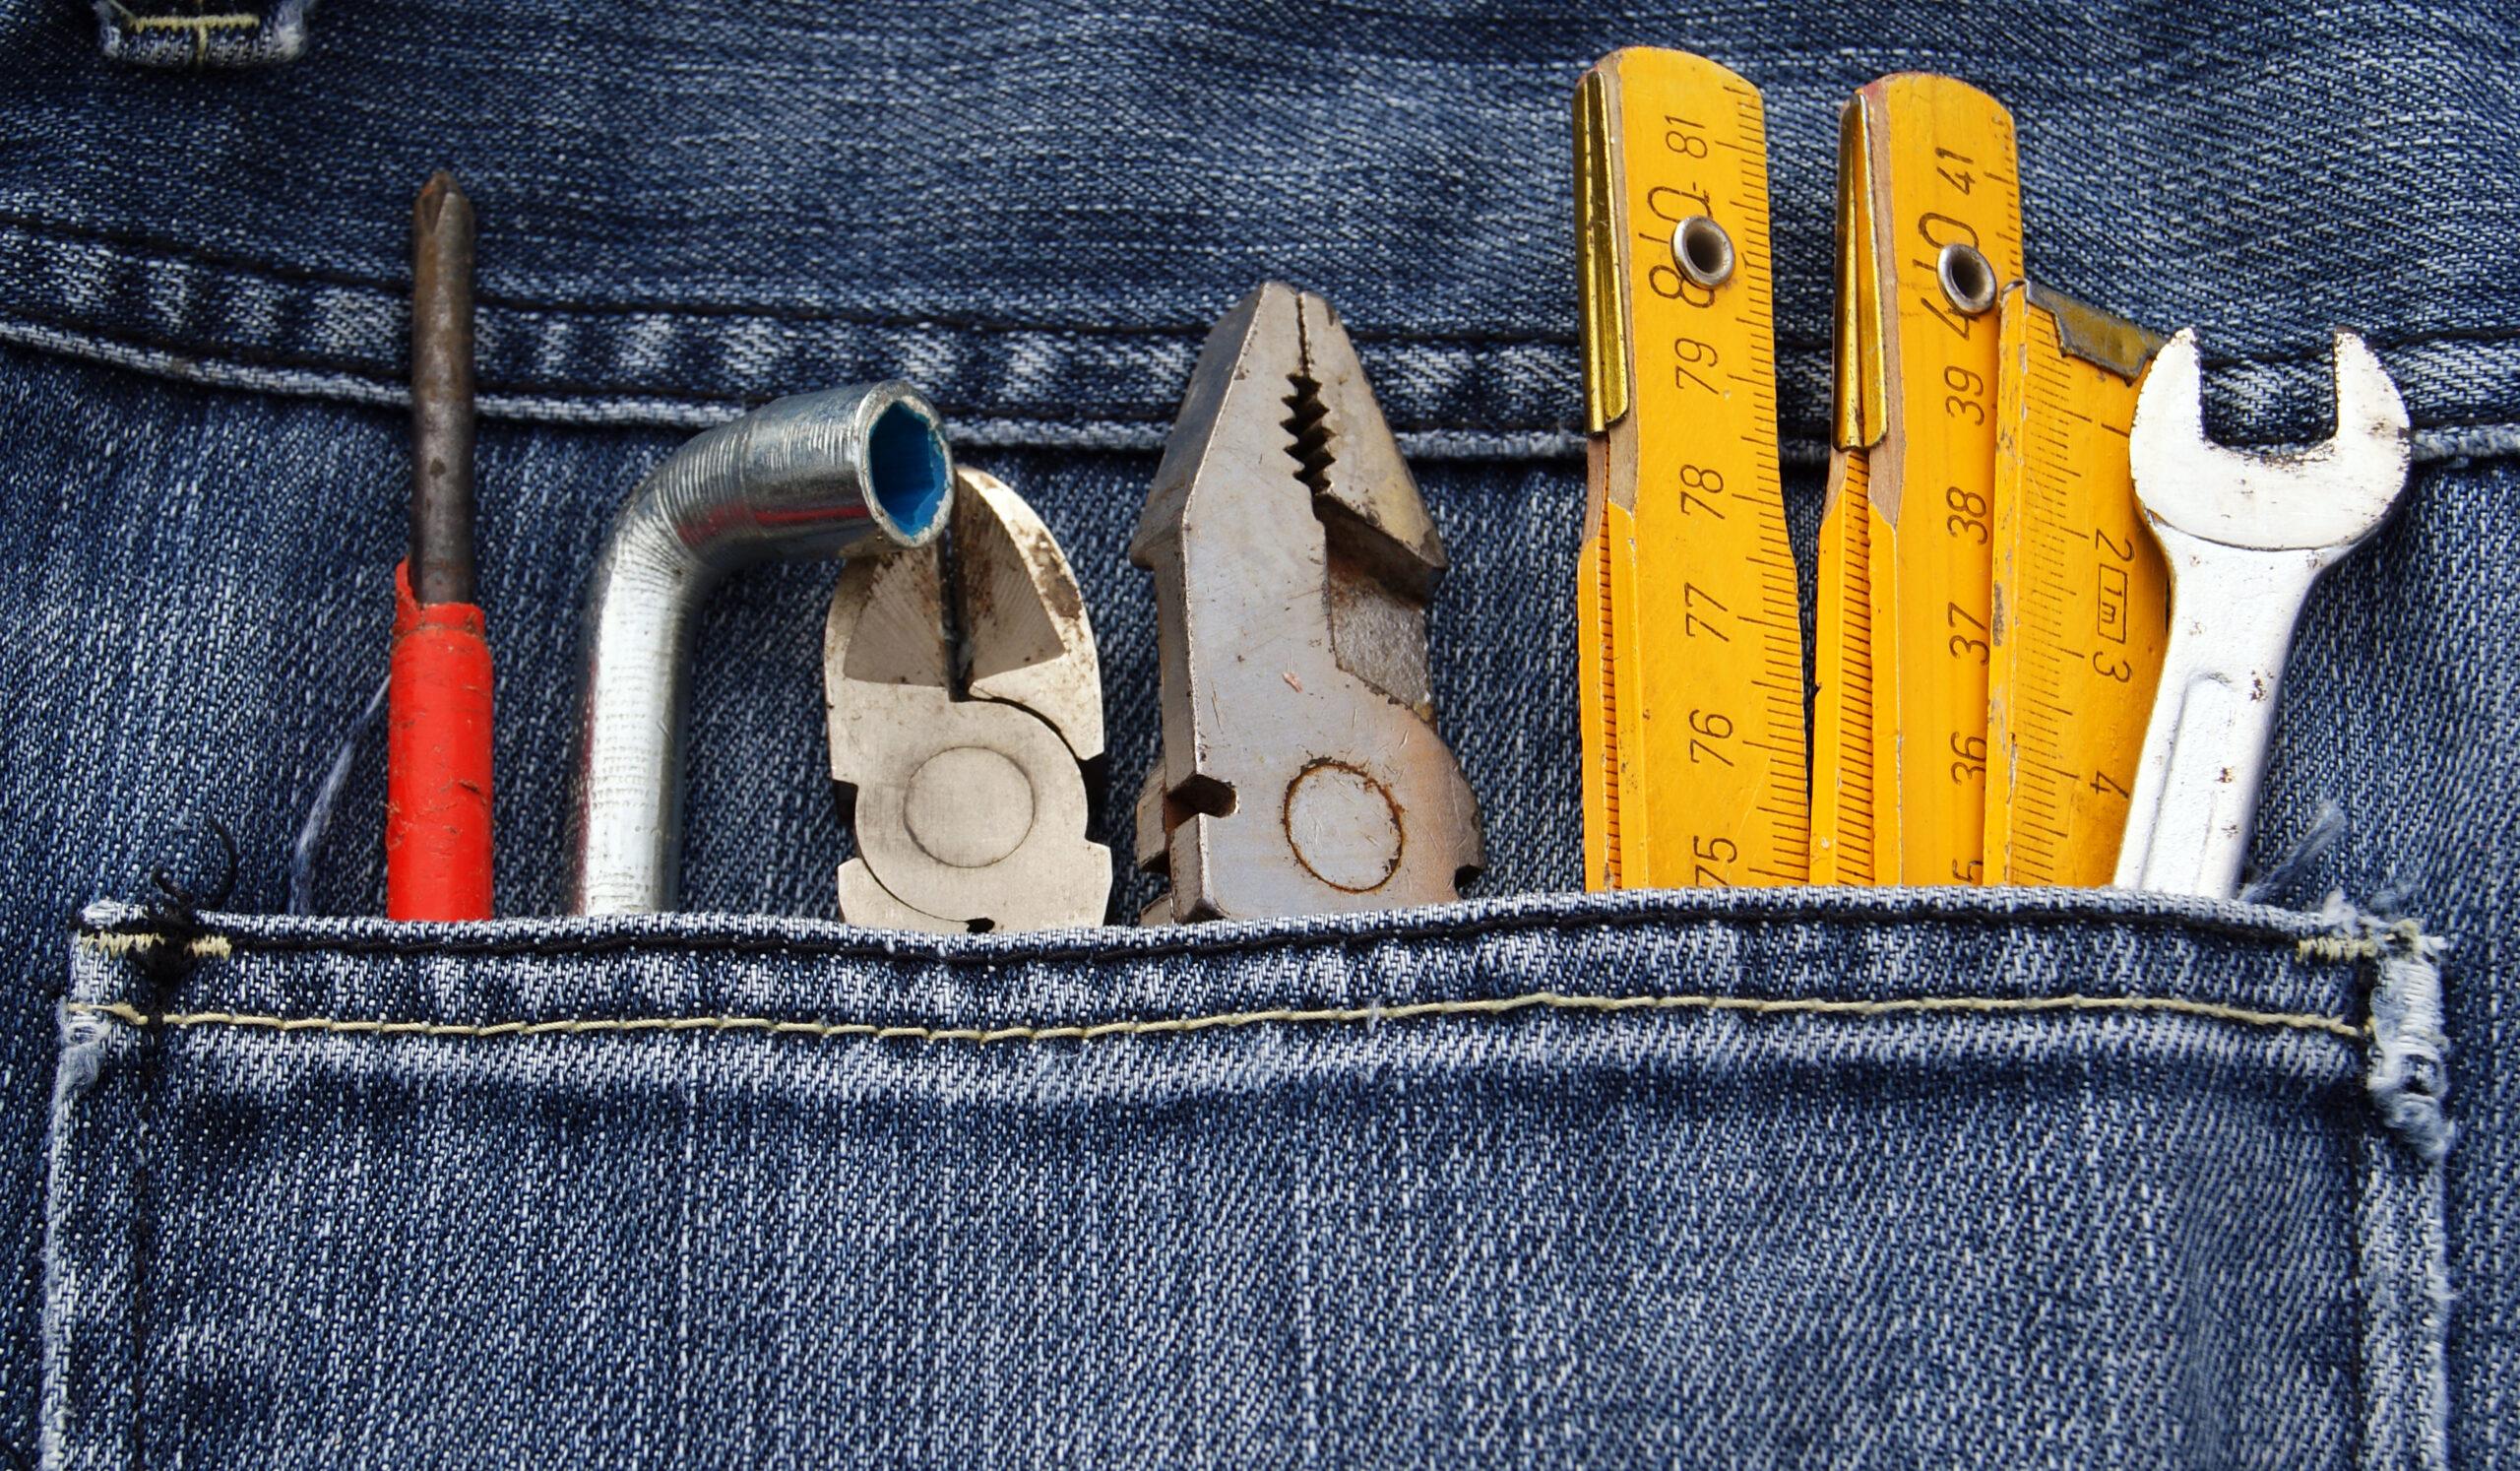 Tool,Jeans,Pocket